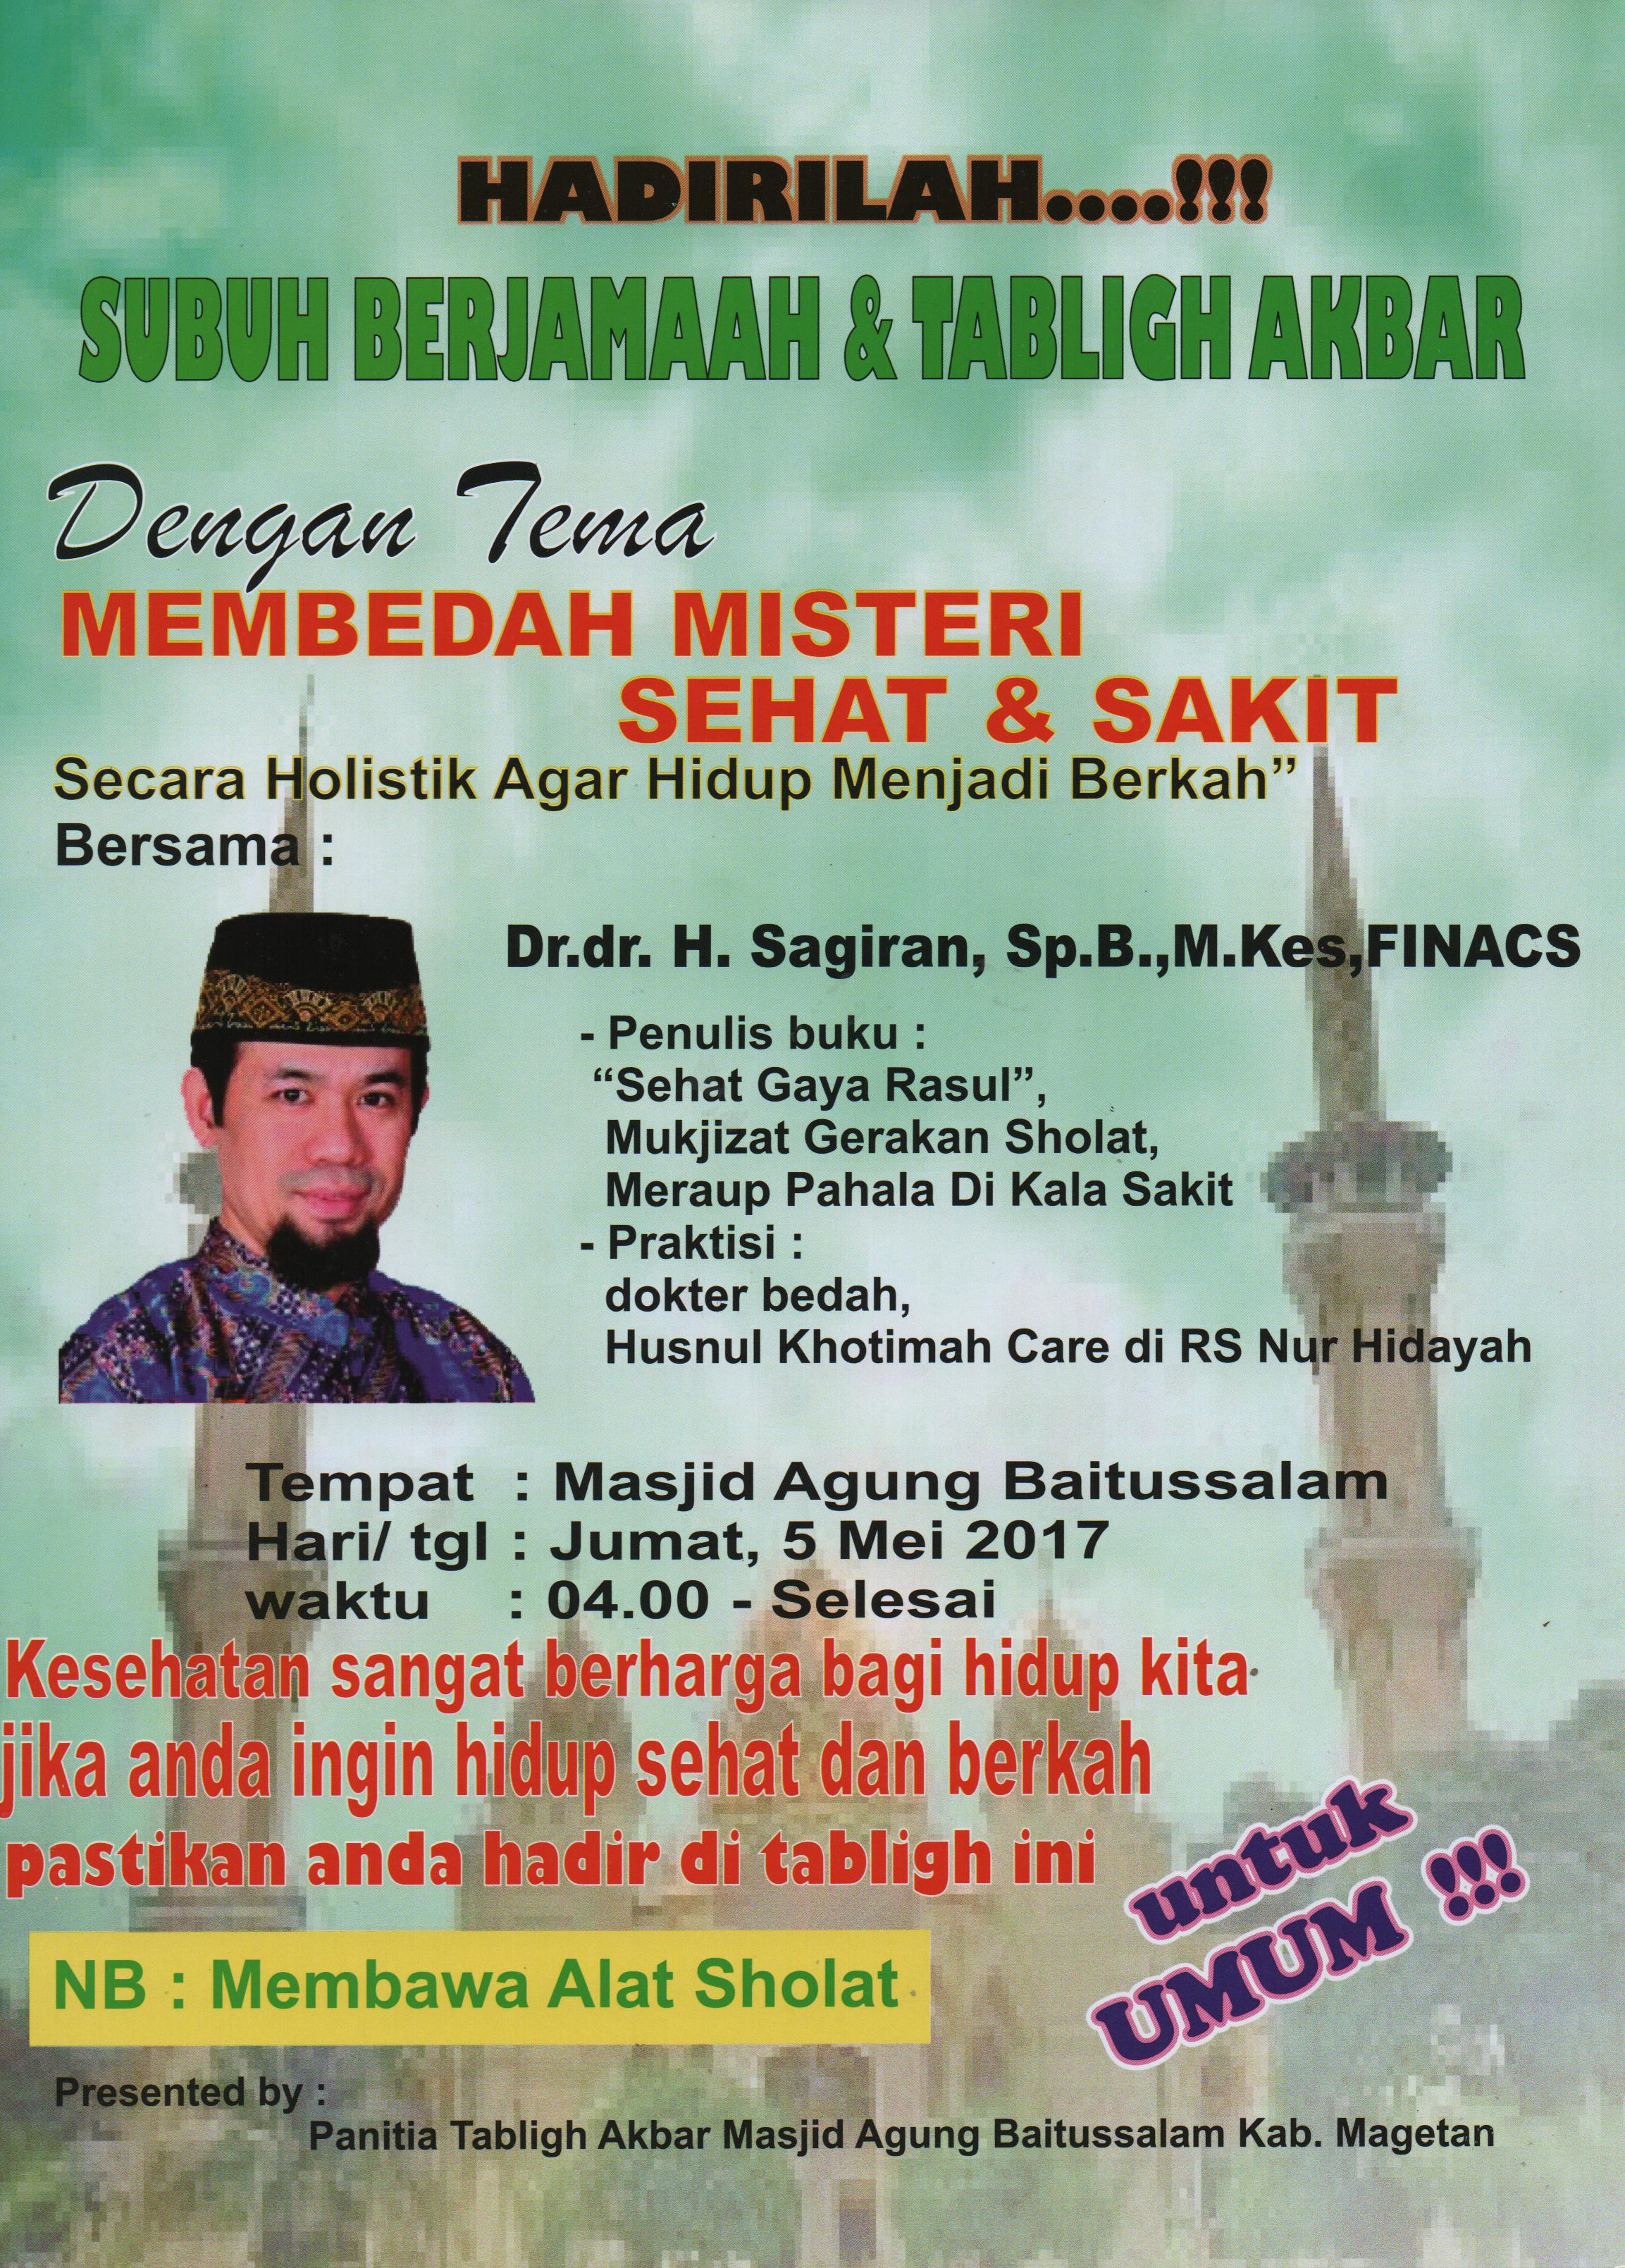 Subuh Berjamaah Tabligh Akbar Drupal Jpg Masjid Agung Baitussalam Kab